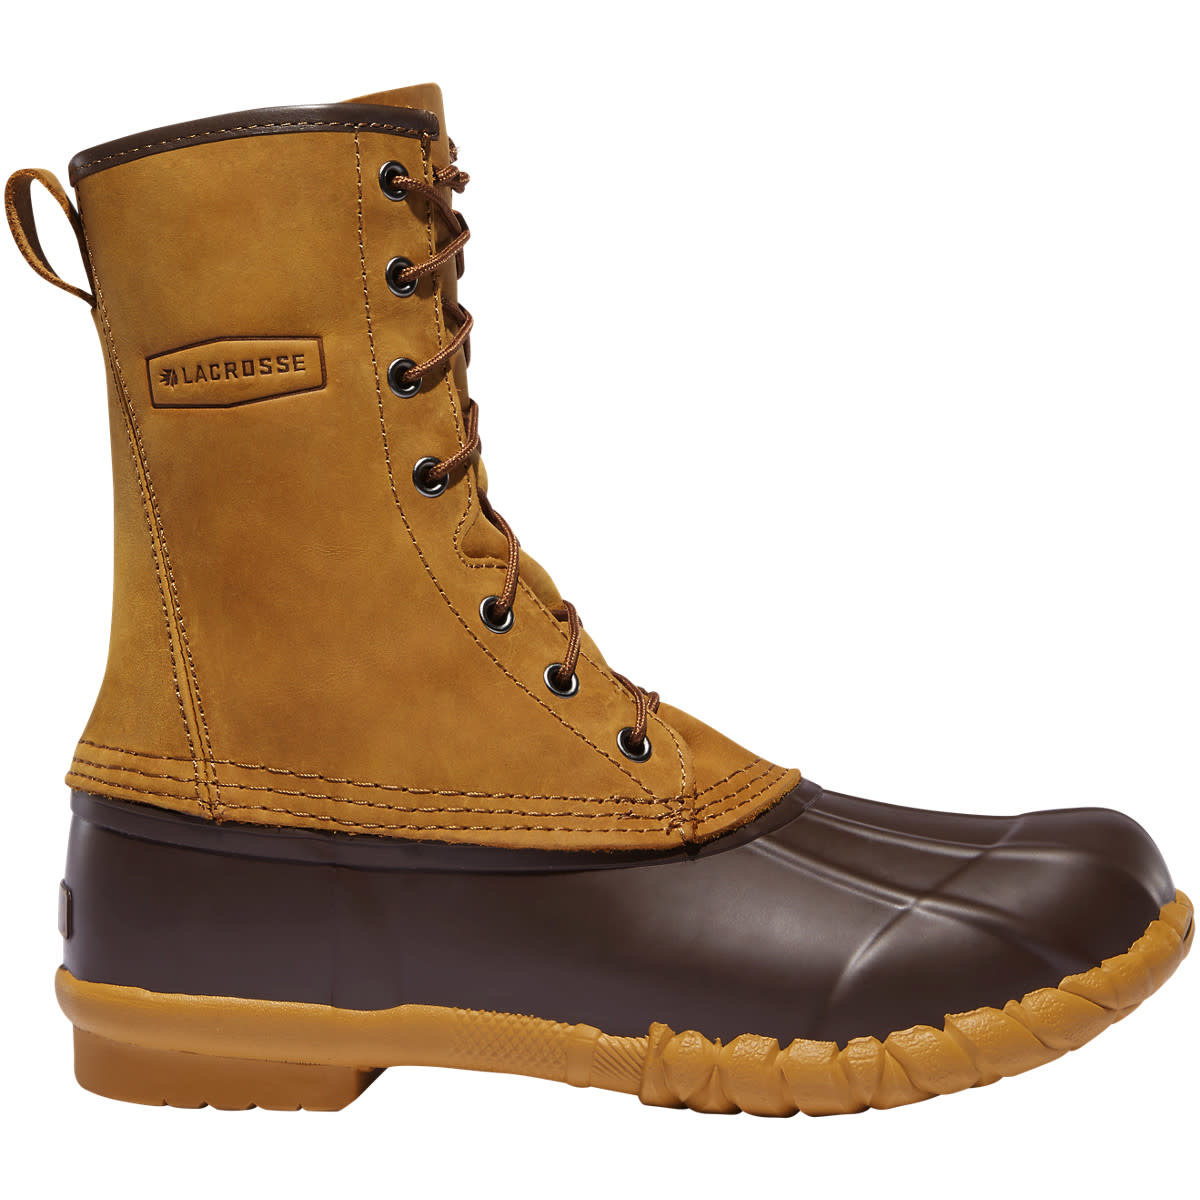 "Uplander II 10"" Brown-1"